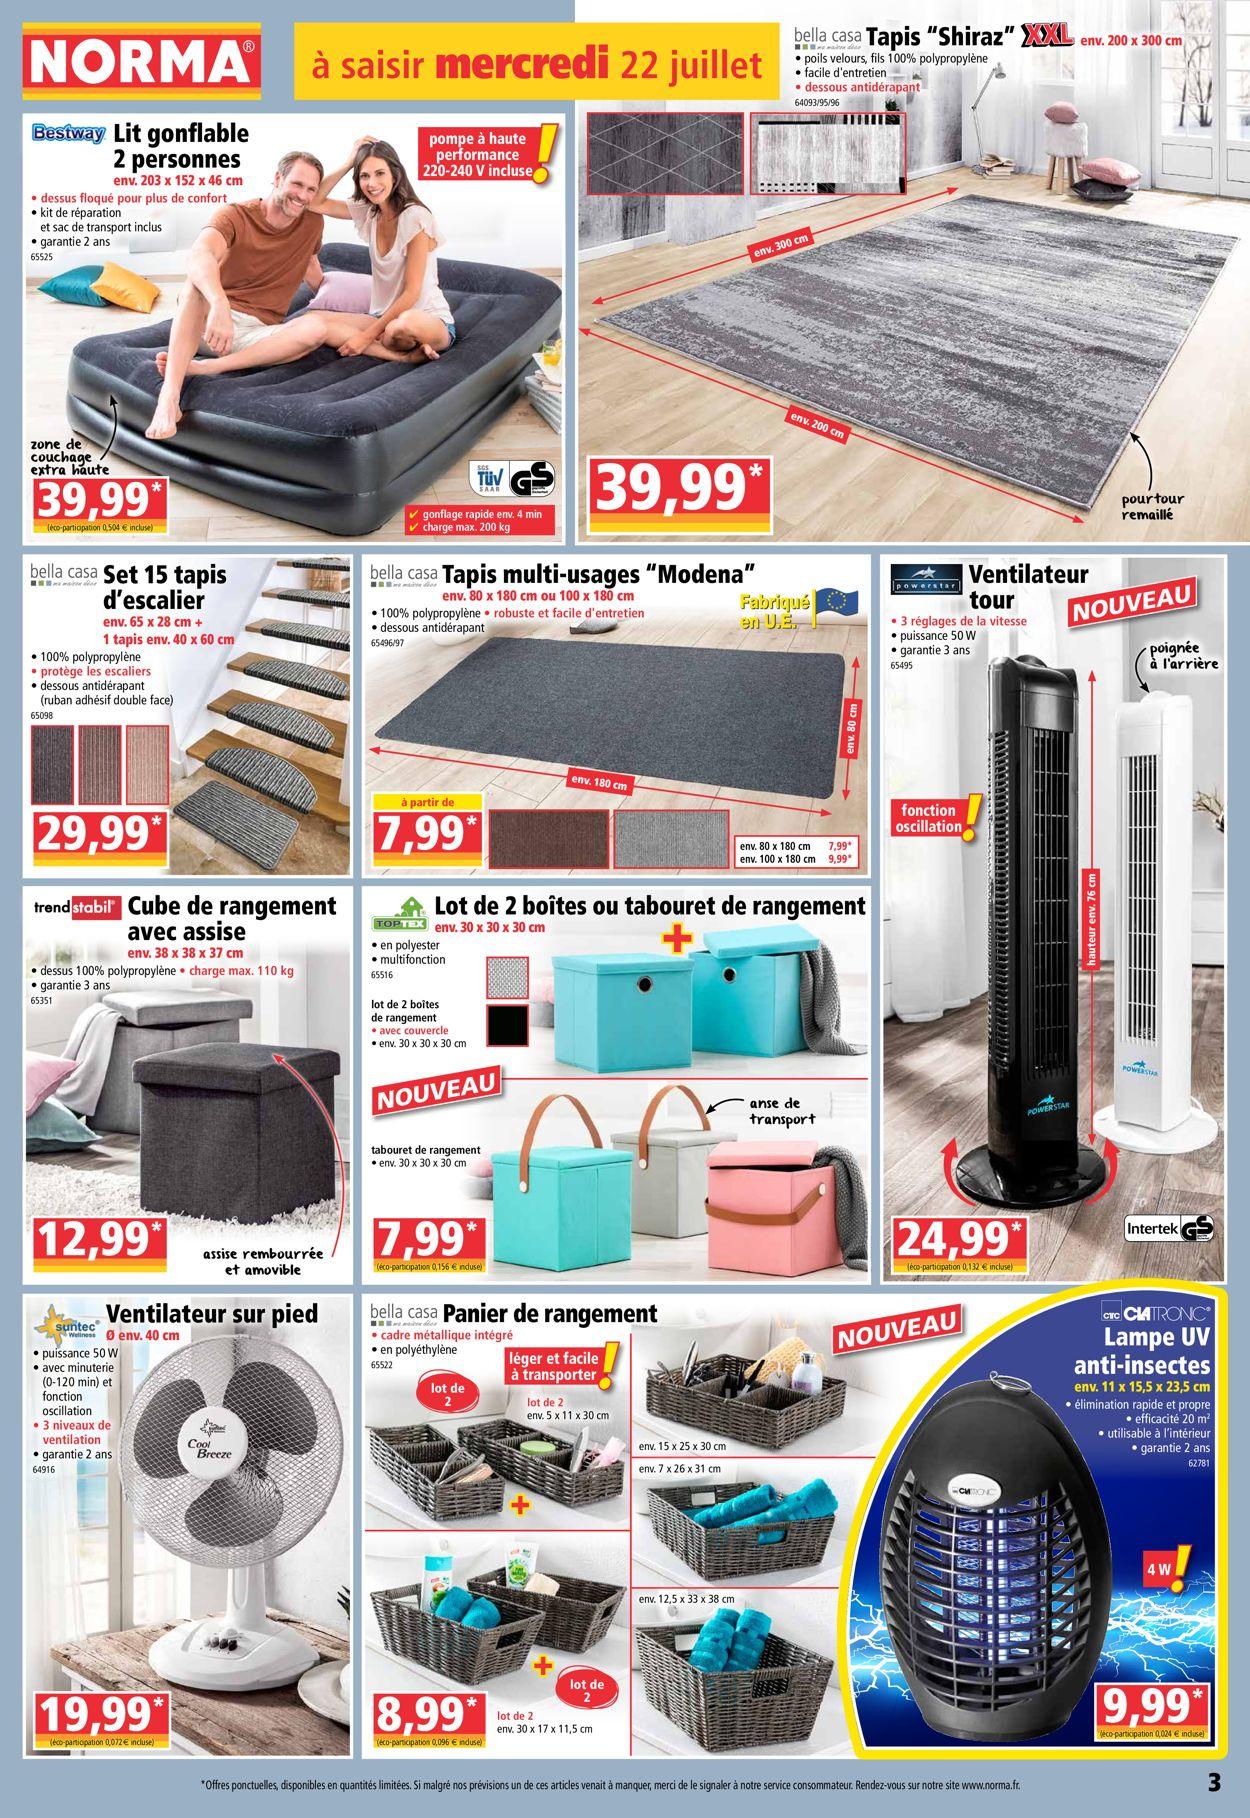 Norma Catalogue - 22.07-29.07.2020 (Page 3)